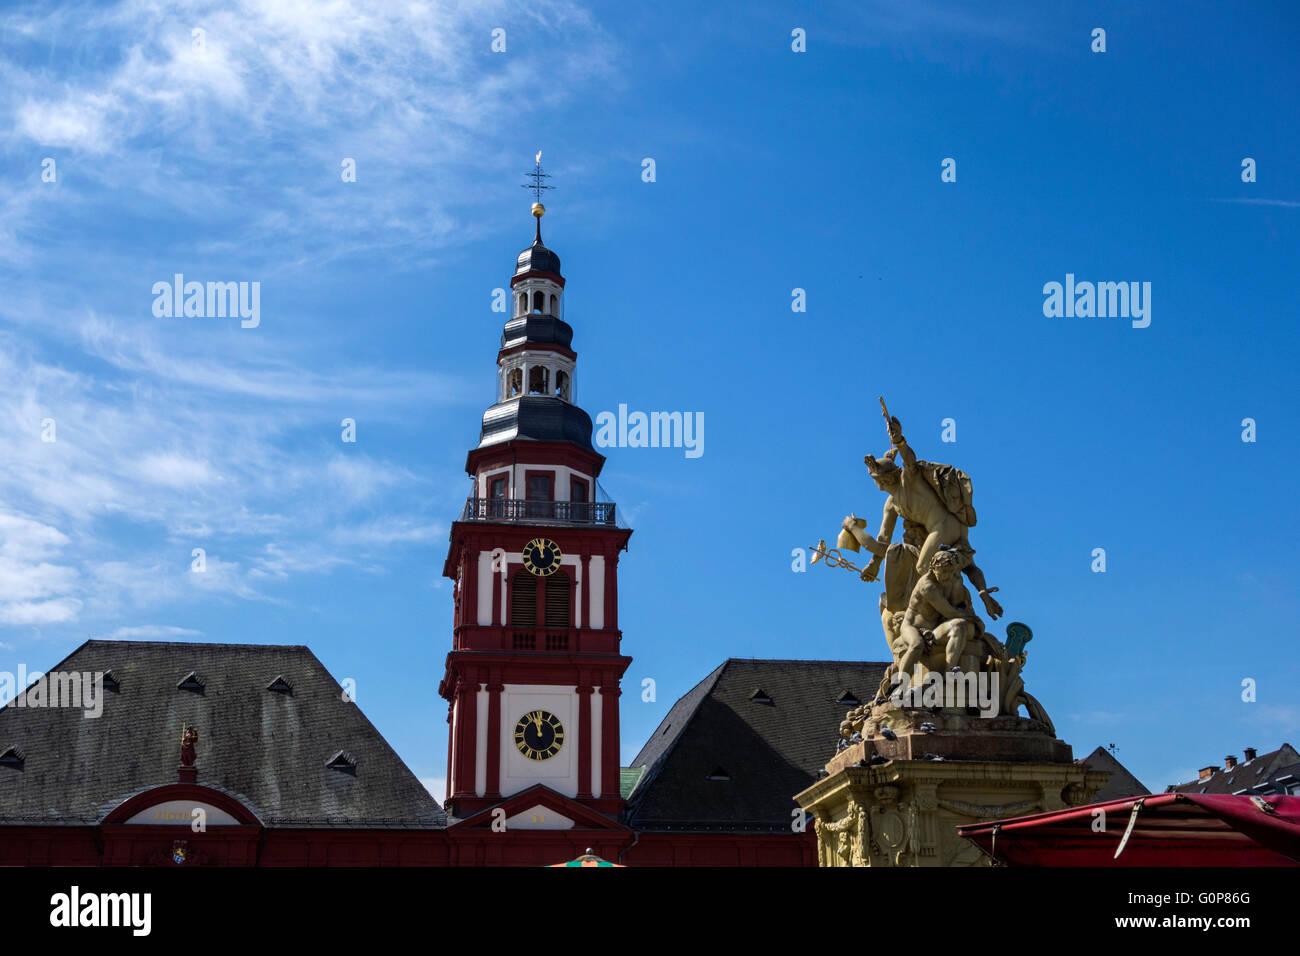 Marktplatz Mannheim - Stock Image